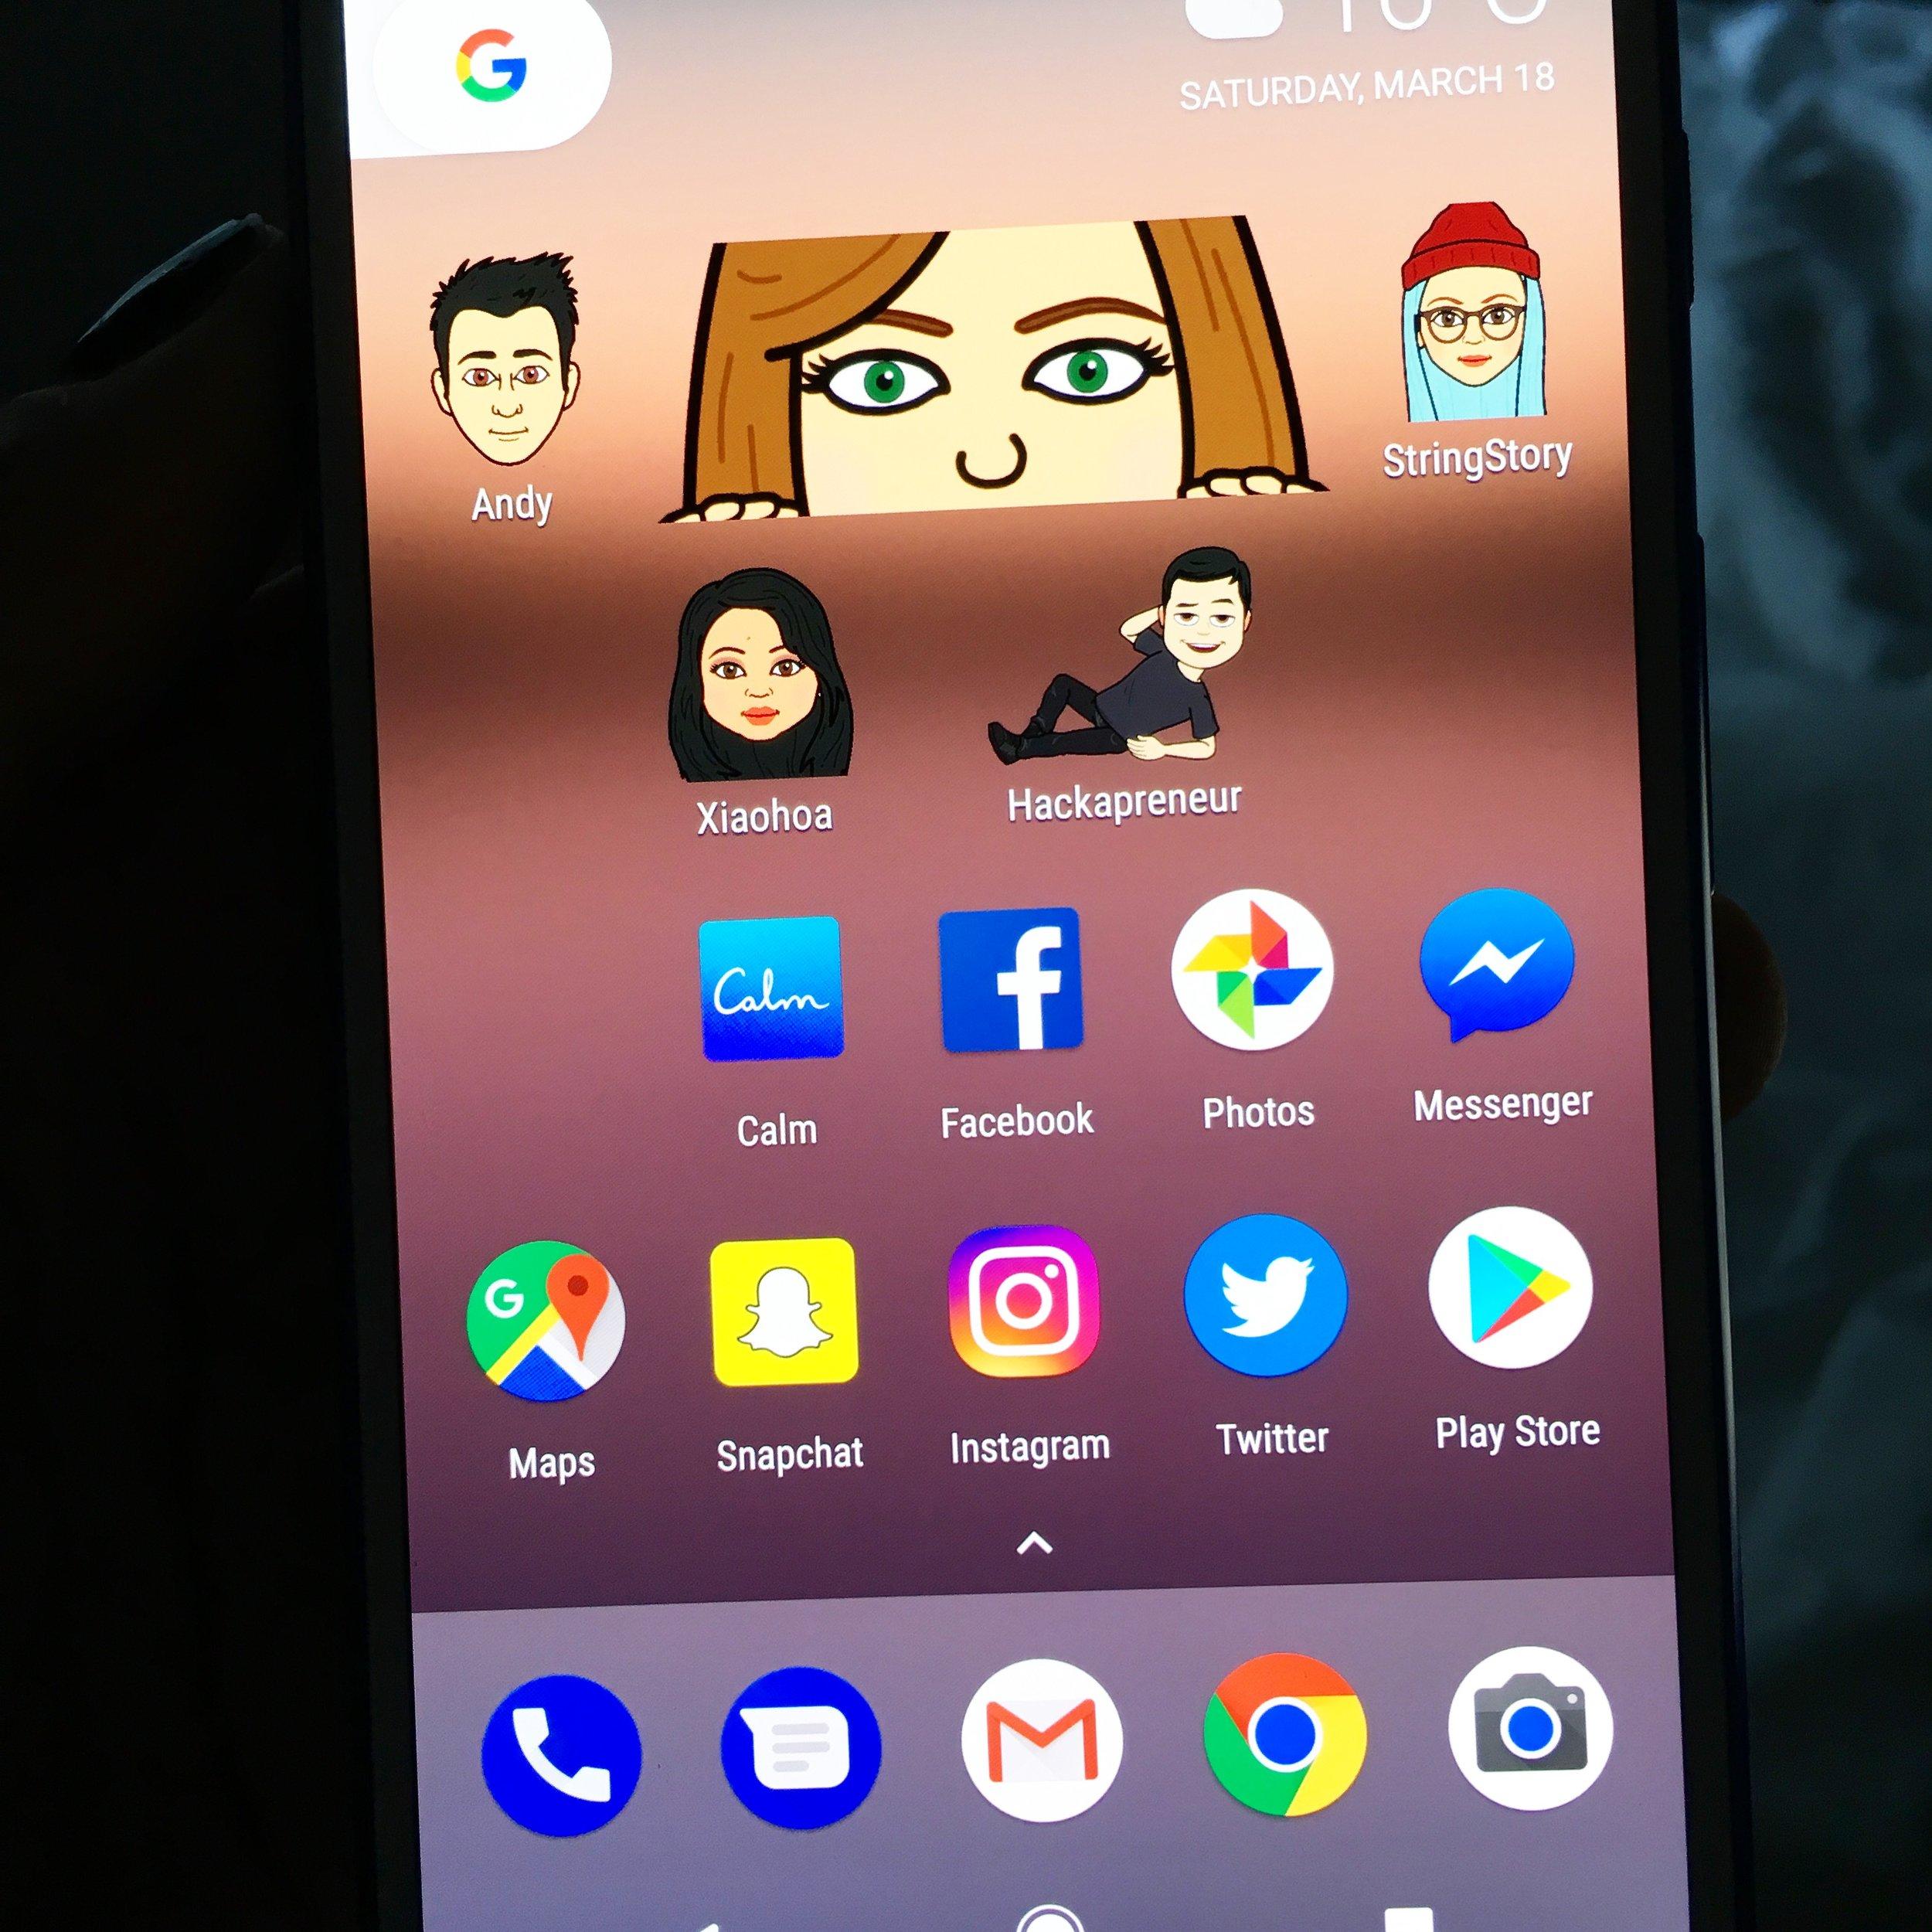 Snapchat Bitmoji widget